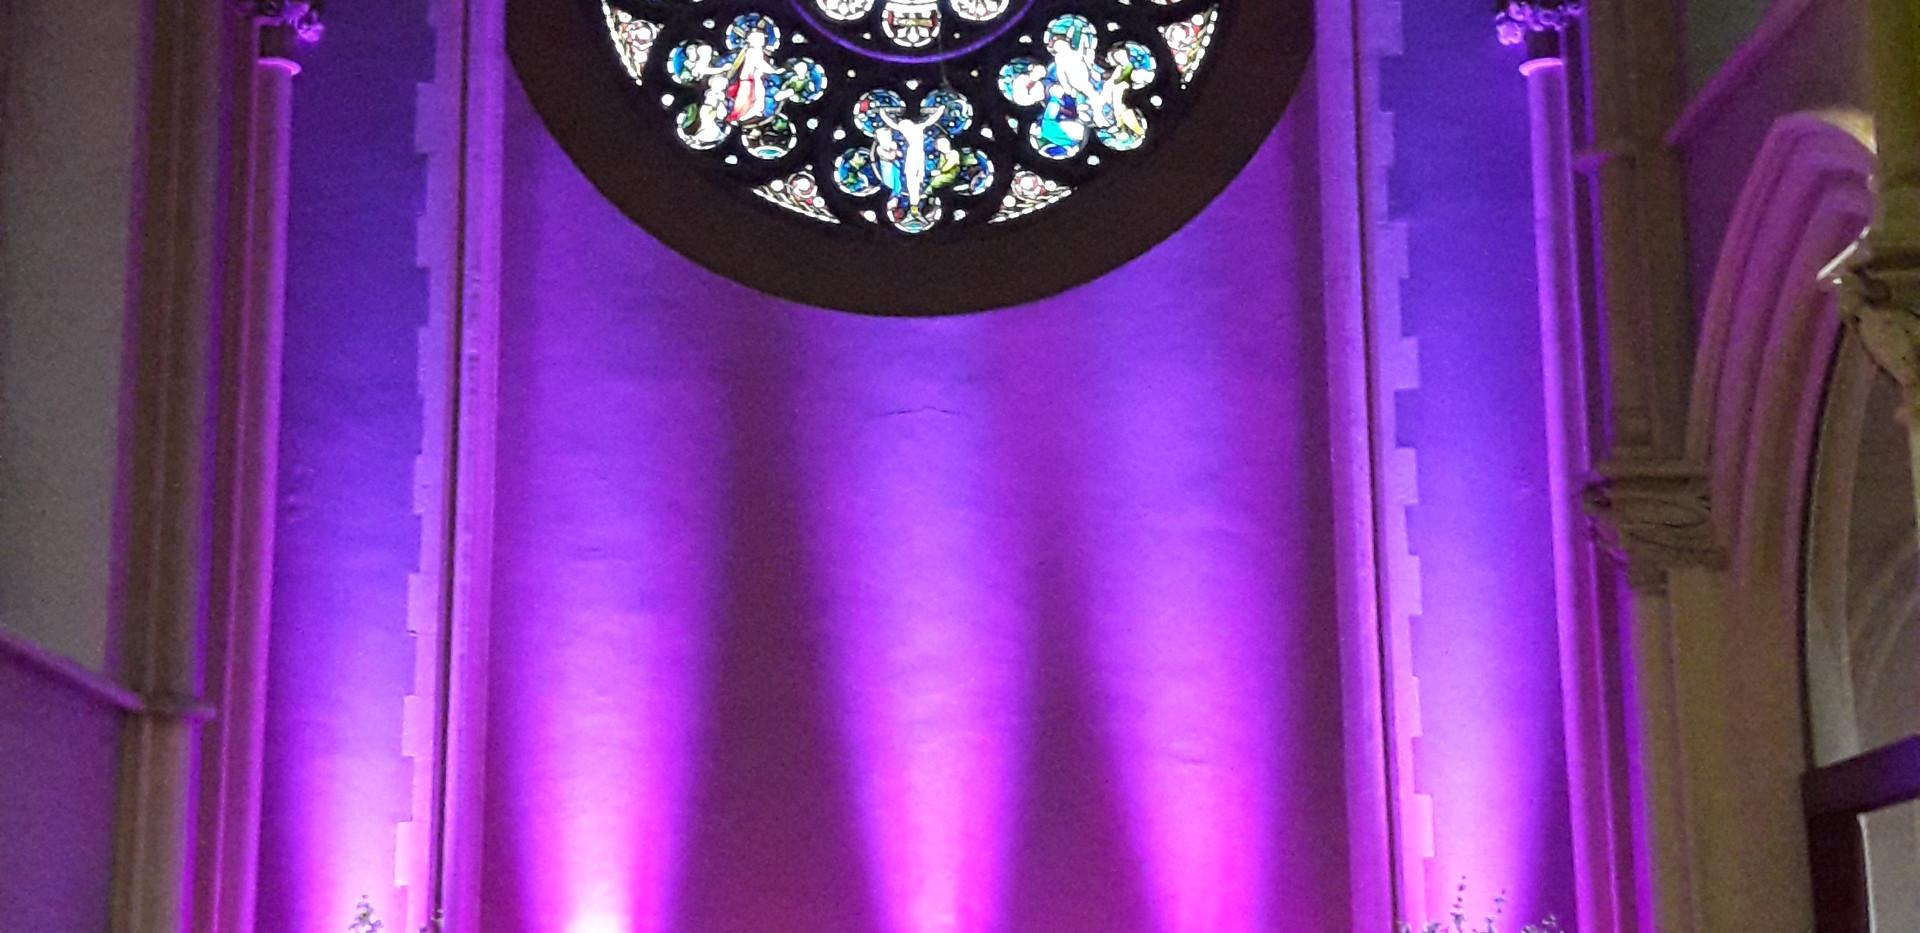 LED venue uplighters lighting hire